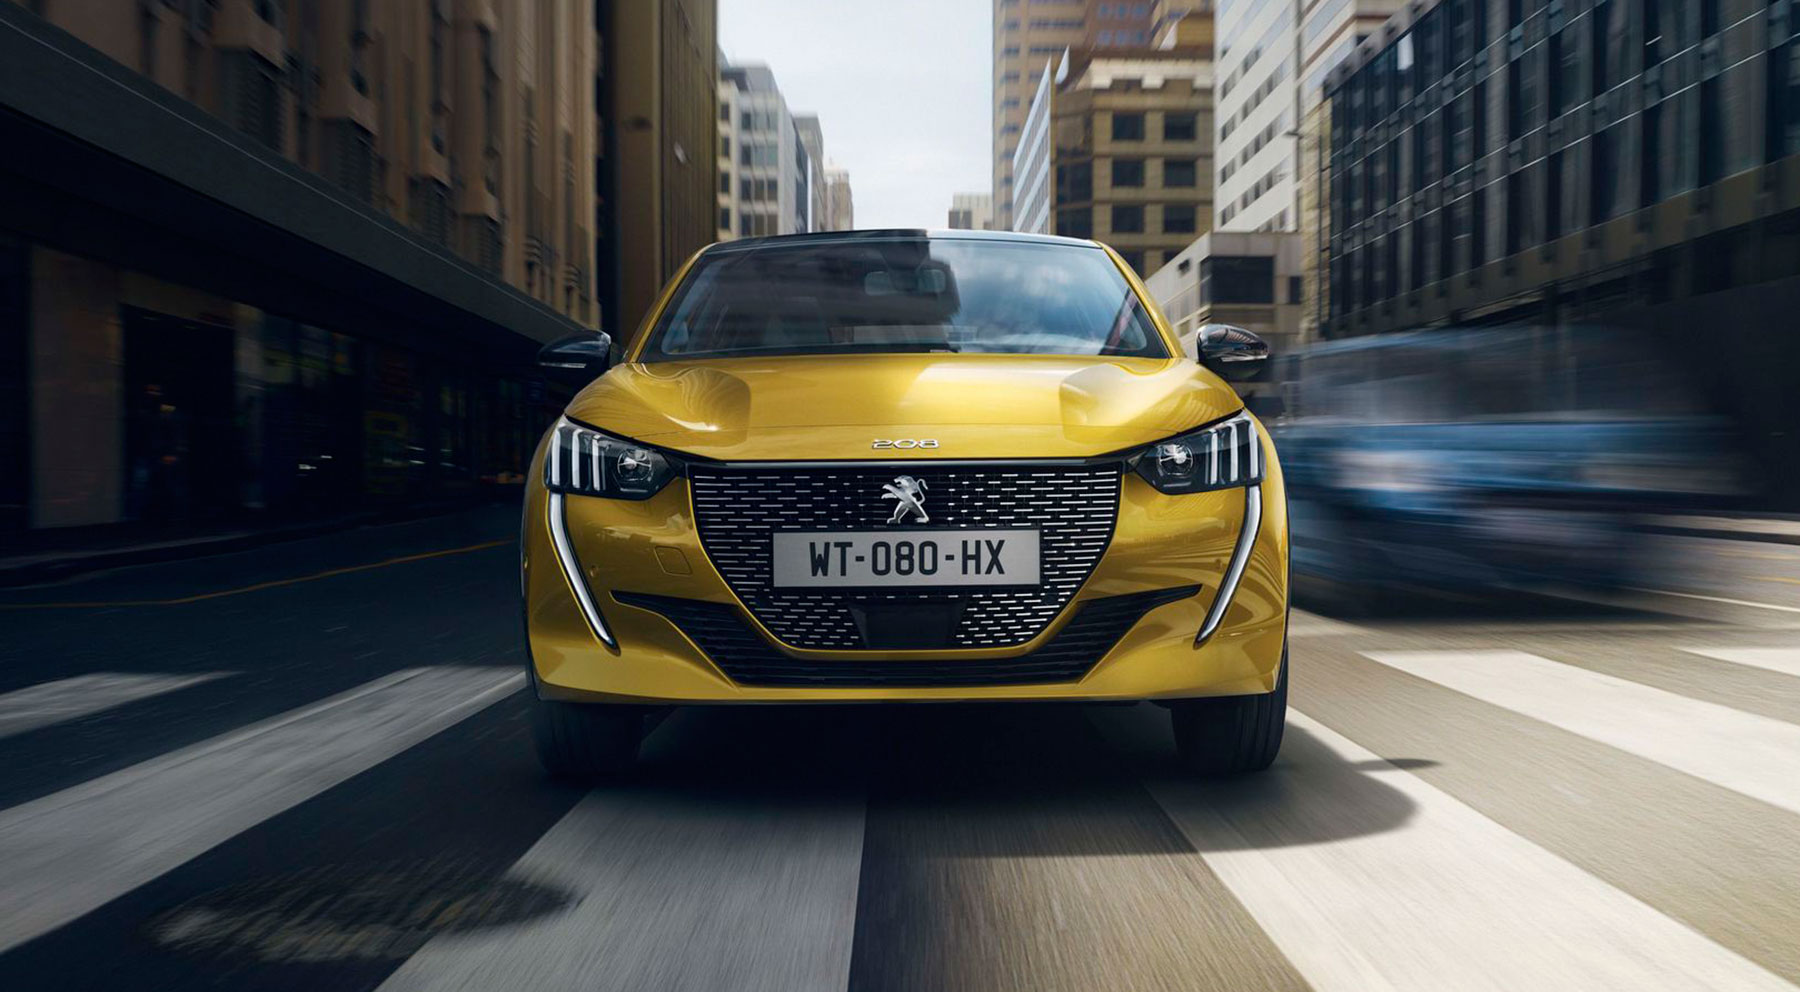 Las imágenes del Peugeot 208